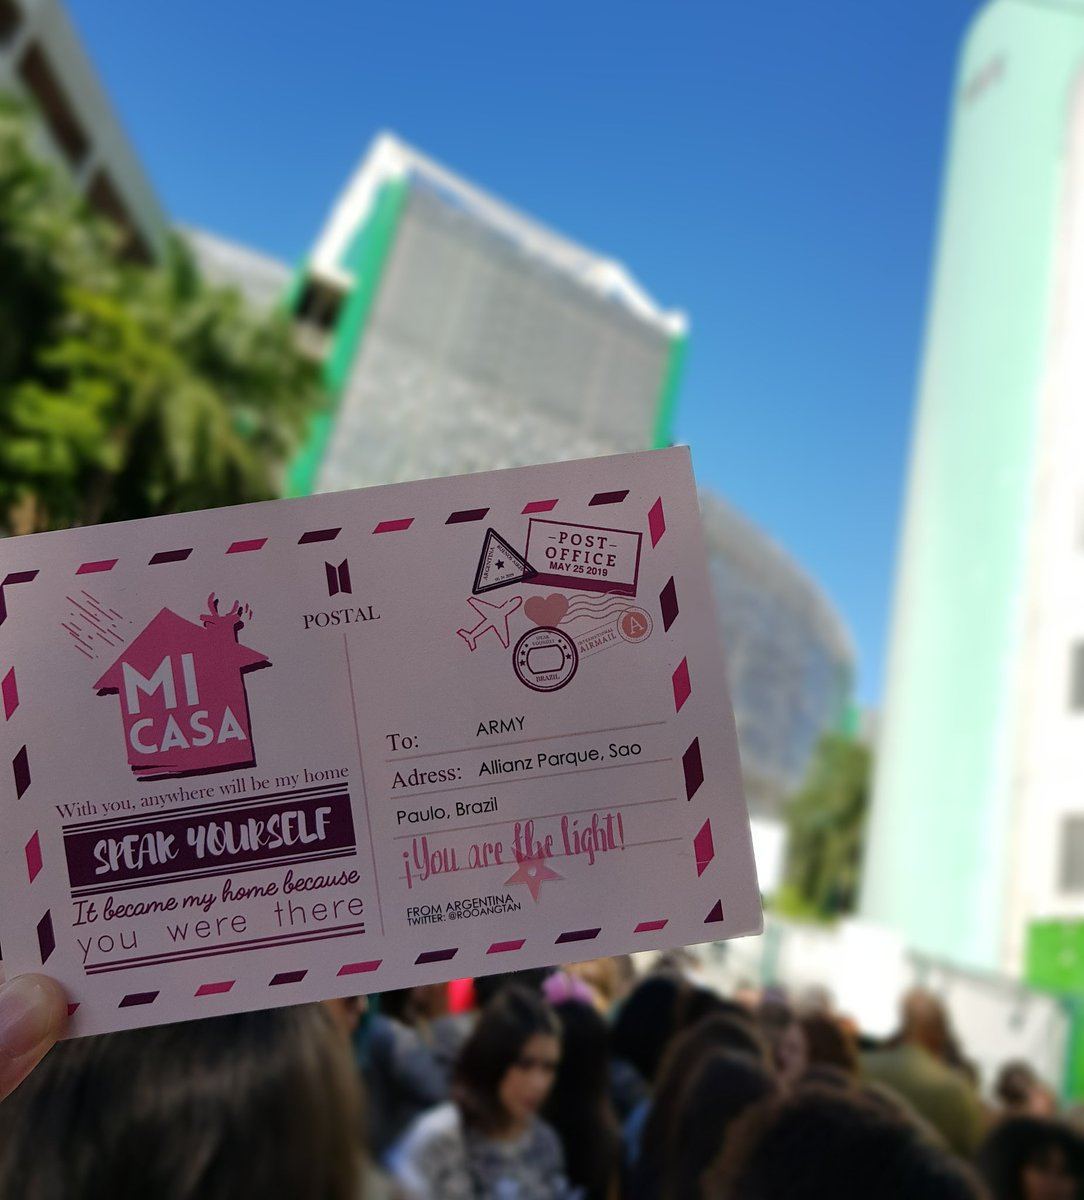 Today&#39;s magic shop  #BTSatAllianzParque @BTS_twt<br>http://pic.twitter.com/xVajjgkP6V